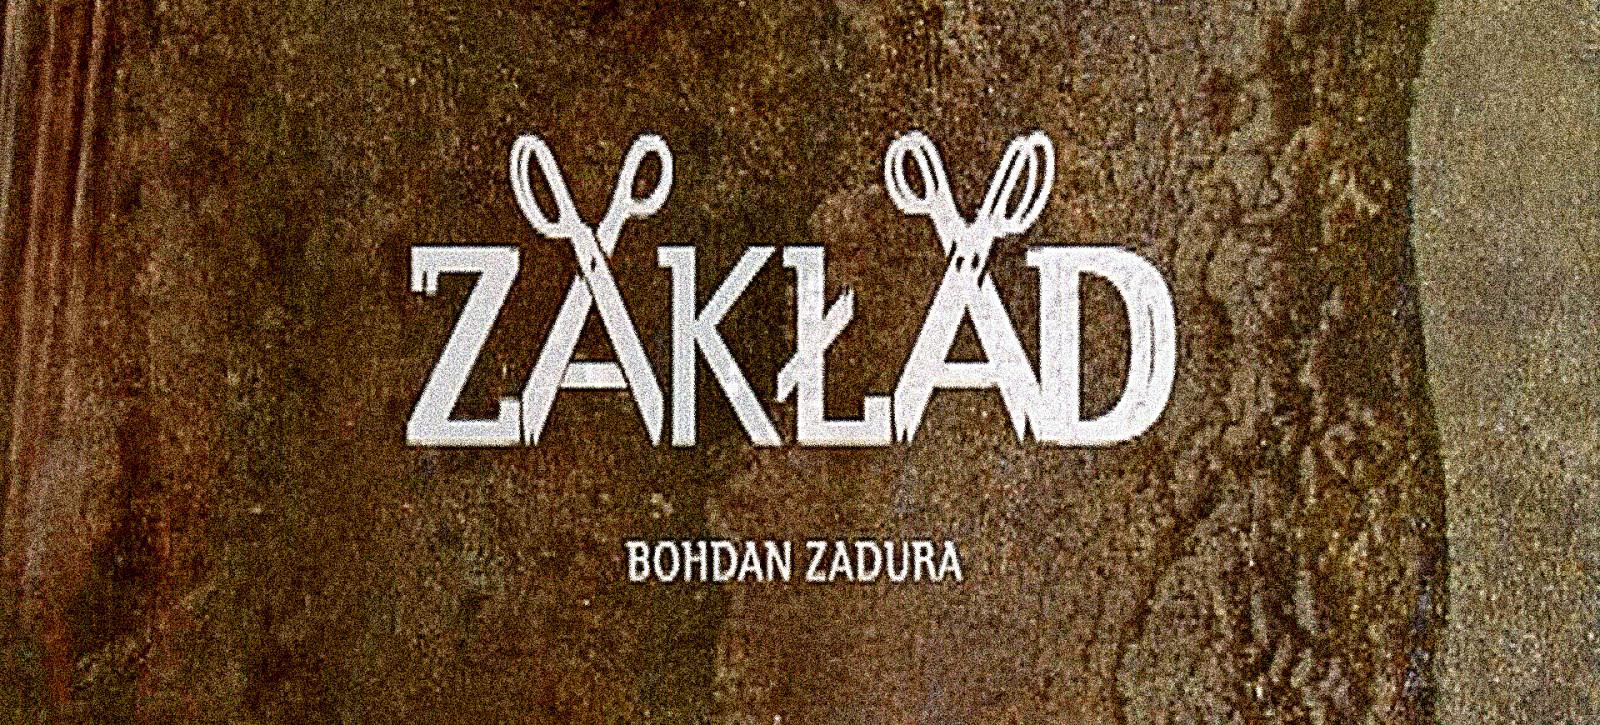 21_NAGRANIA__Bohdan ZADURA__Zakład